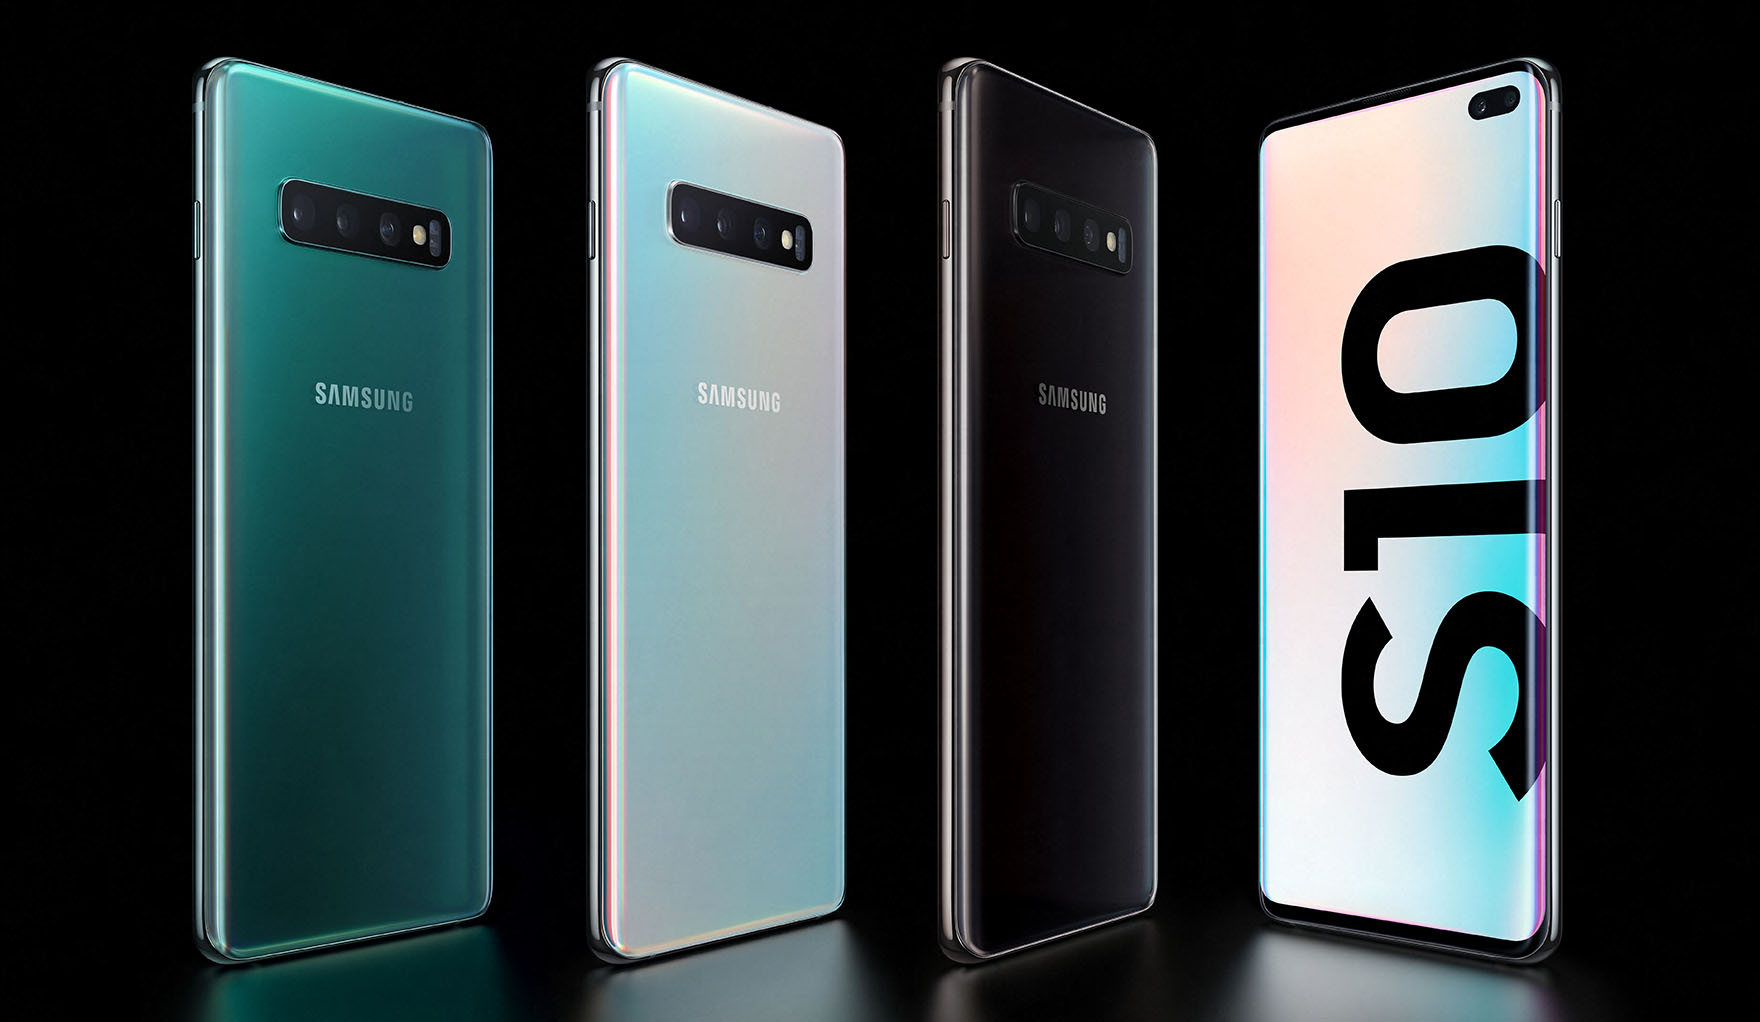 Galaxy s10 technische daten